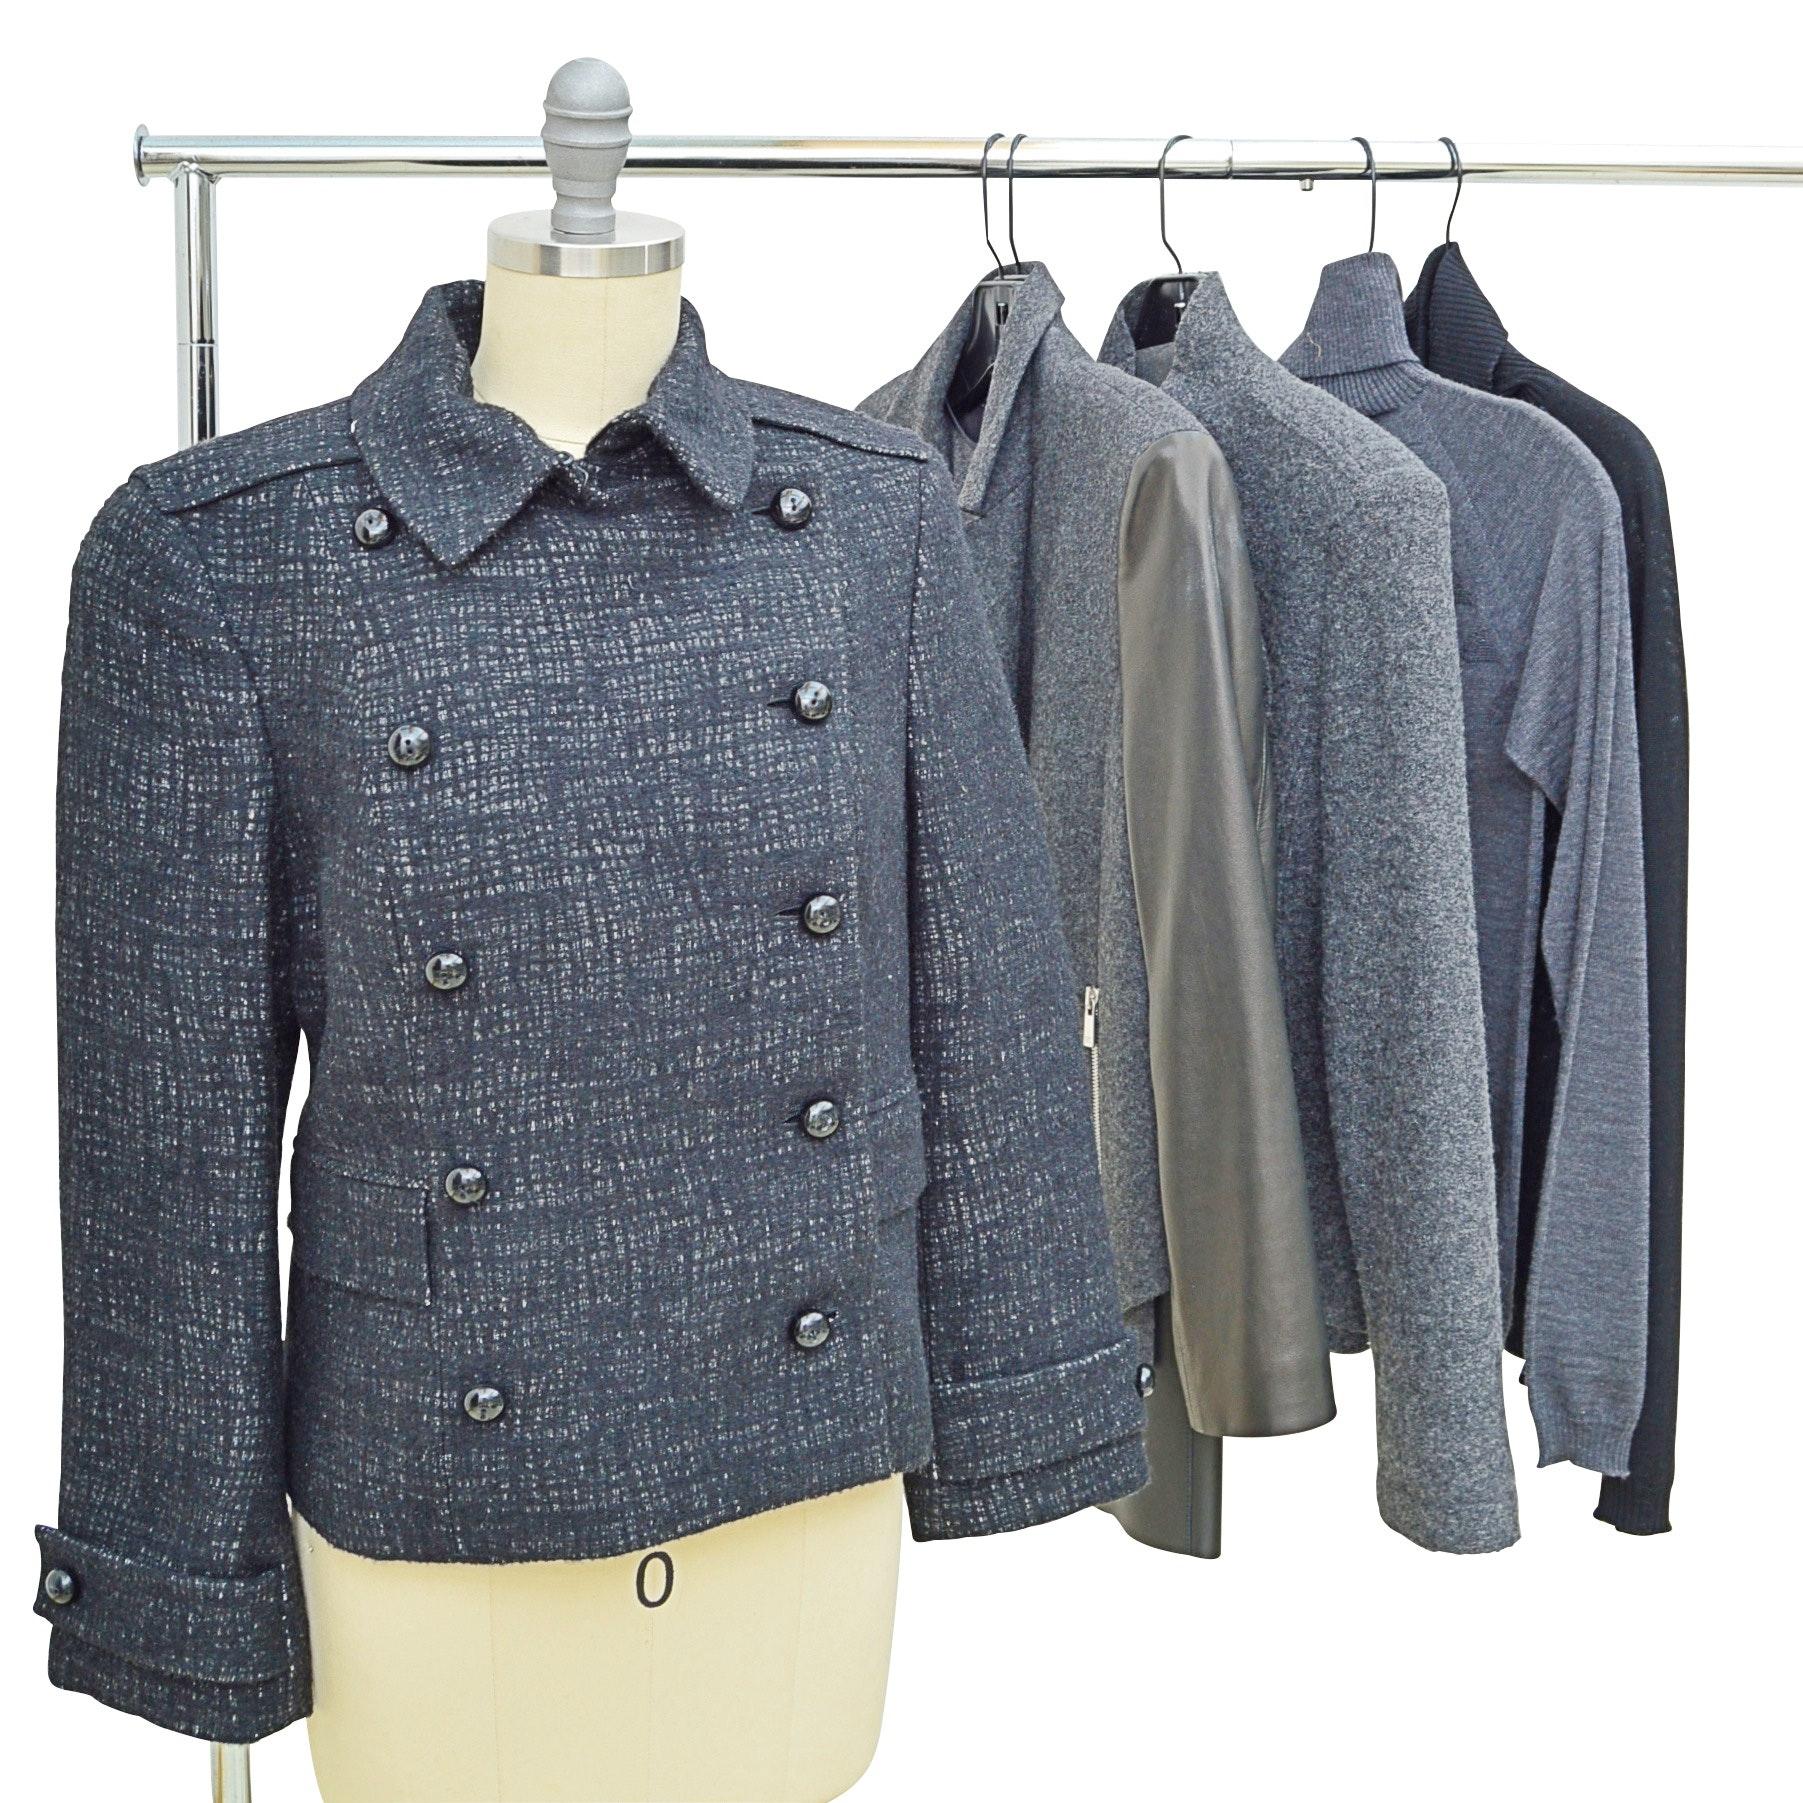 Women's Wool Jackets and Sweaters with Akris, Michael Kors, TSE